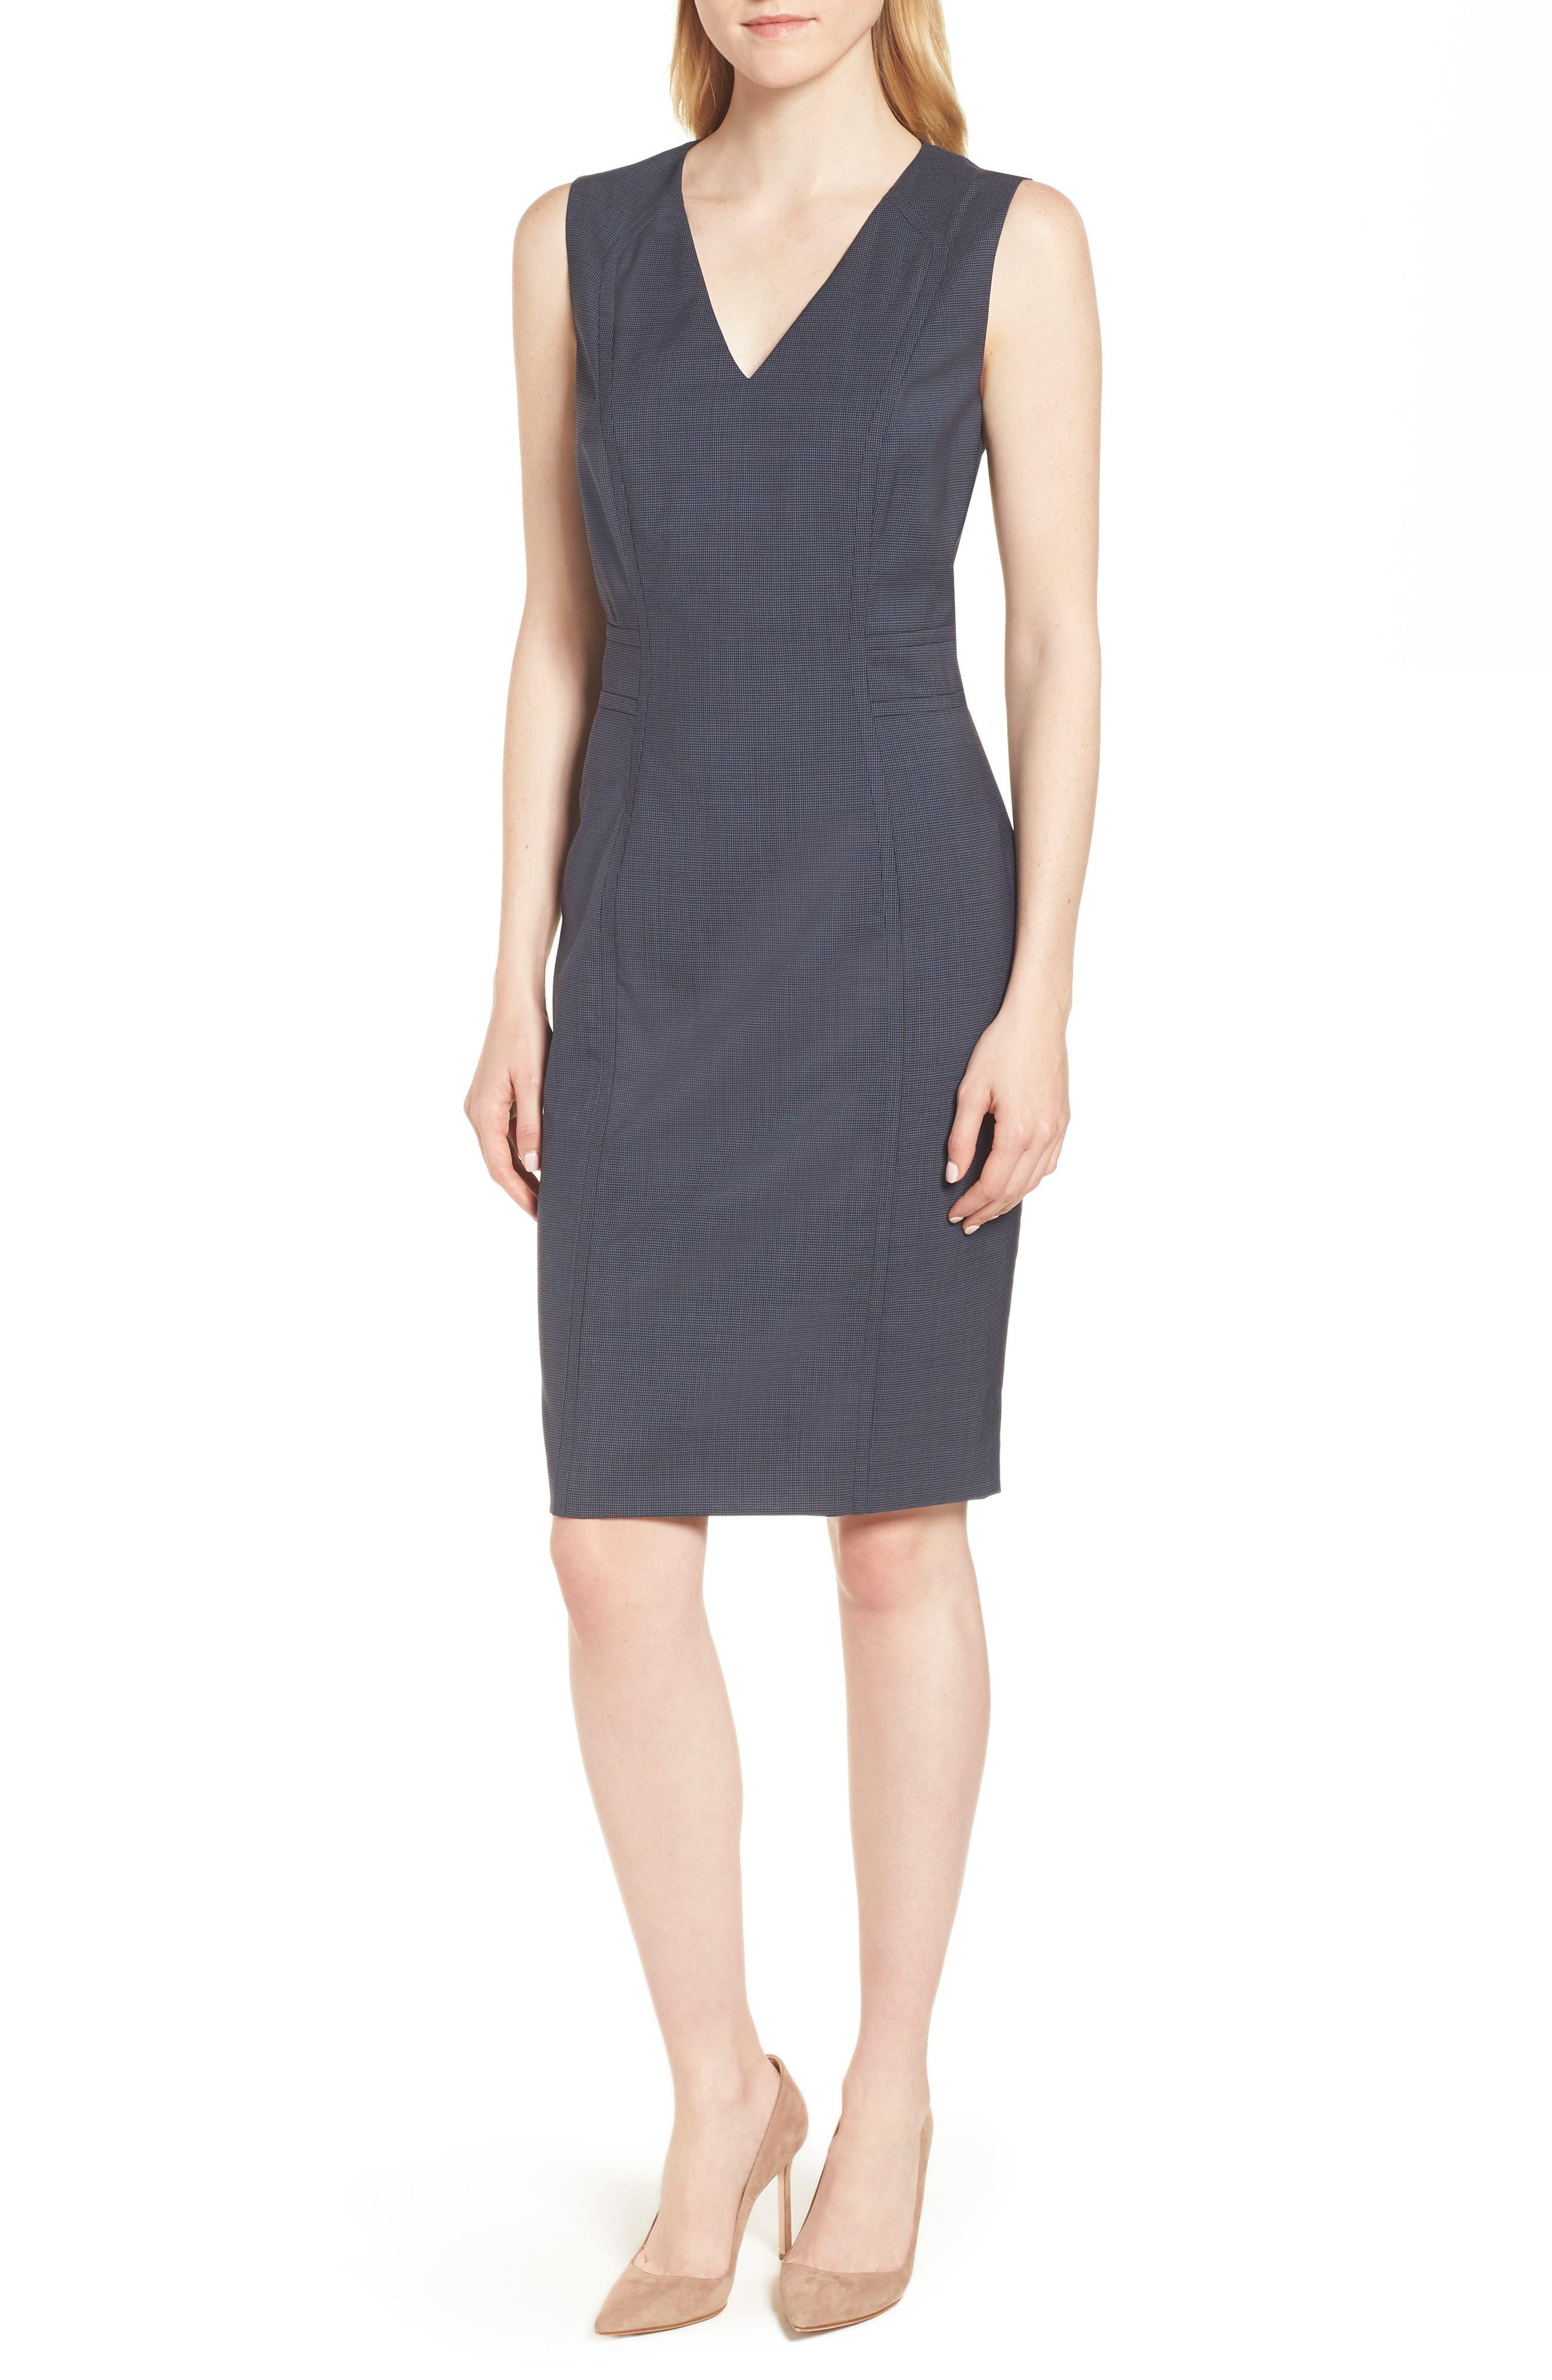 Dalouise Pepita Stretch Wool Sheath Dress,                         Main,                         color, 462